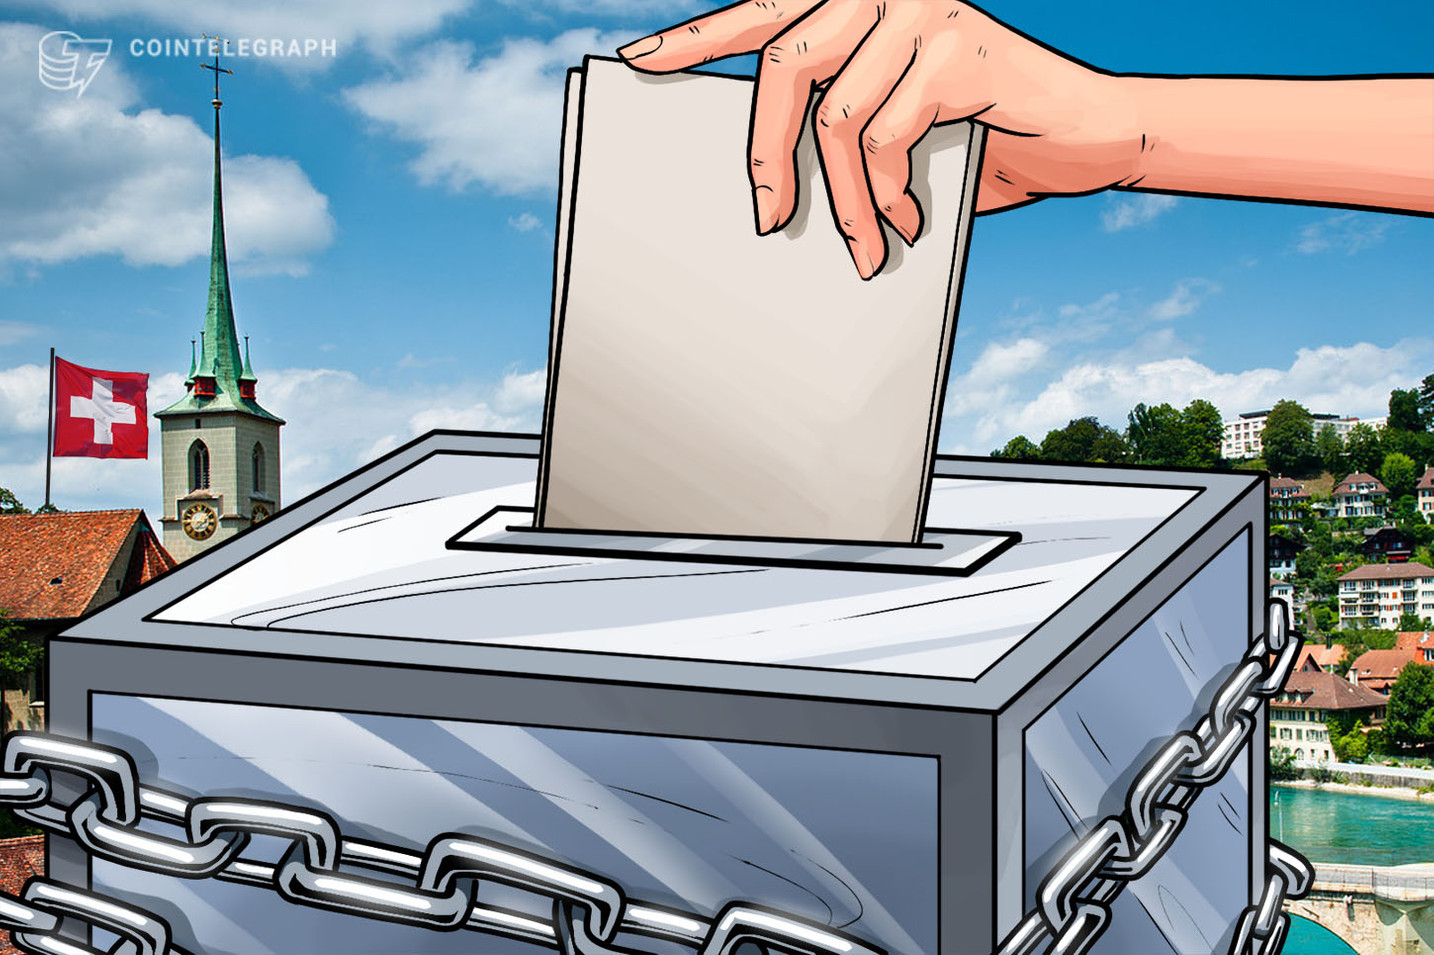 Zug's Head of Comms Calls City Blockchain Voting Test a 'Success', Despite Low Turnout